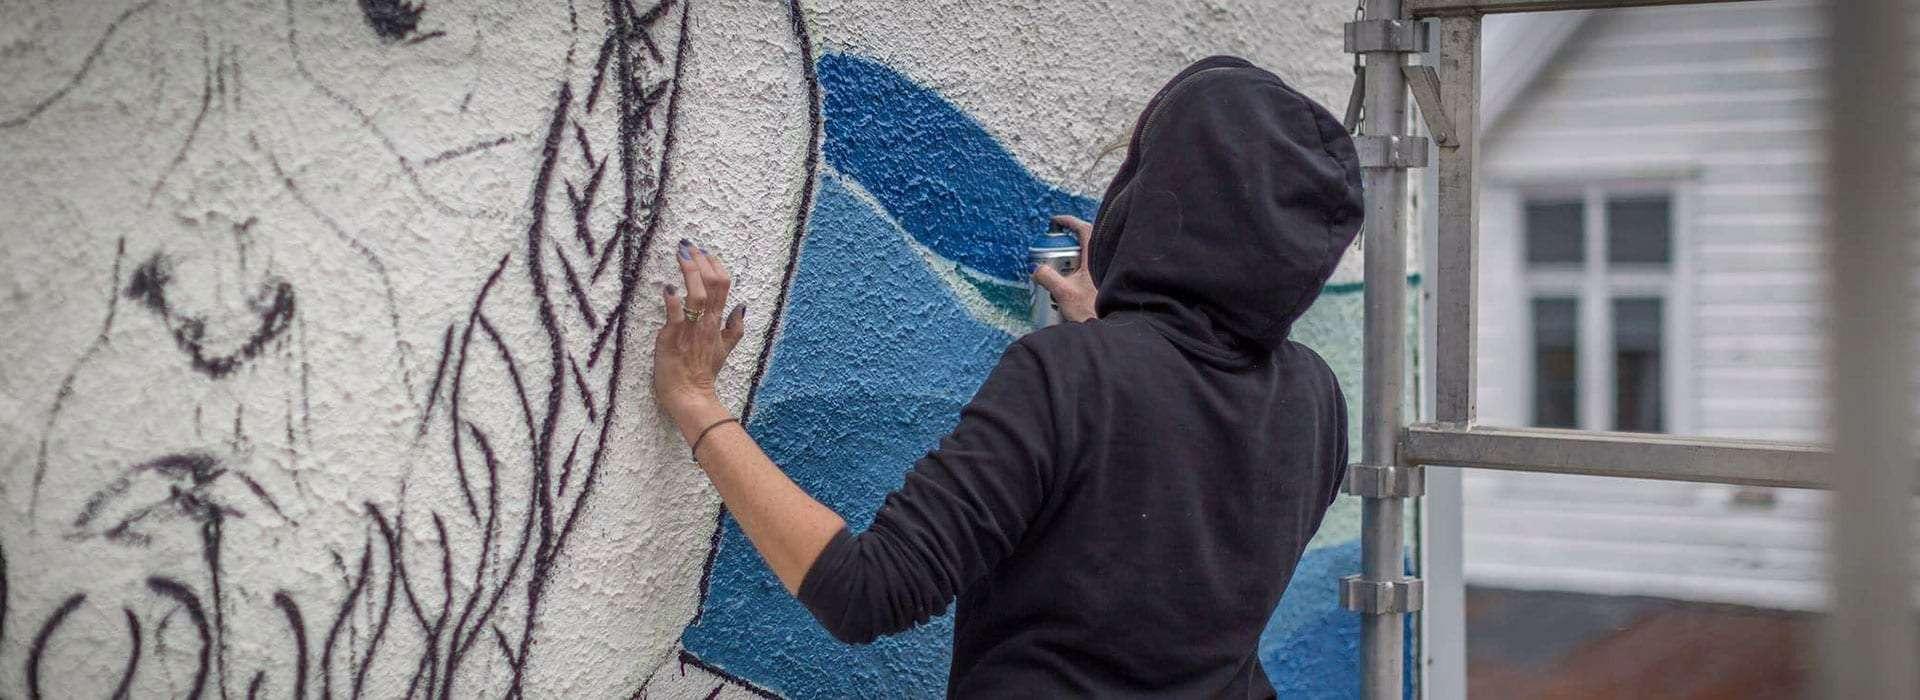 Street art i Florø. Foto.